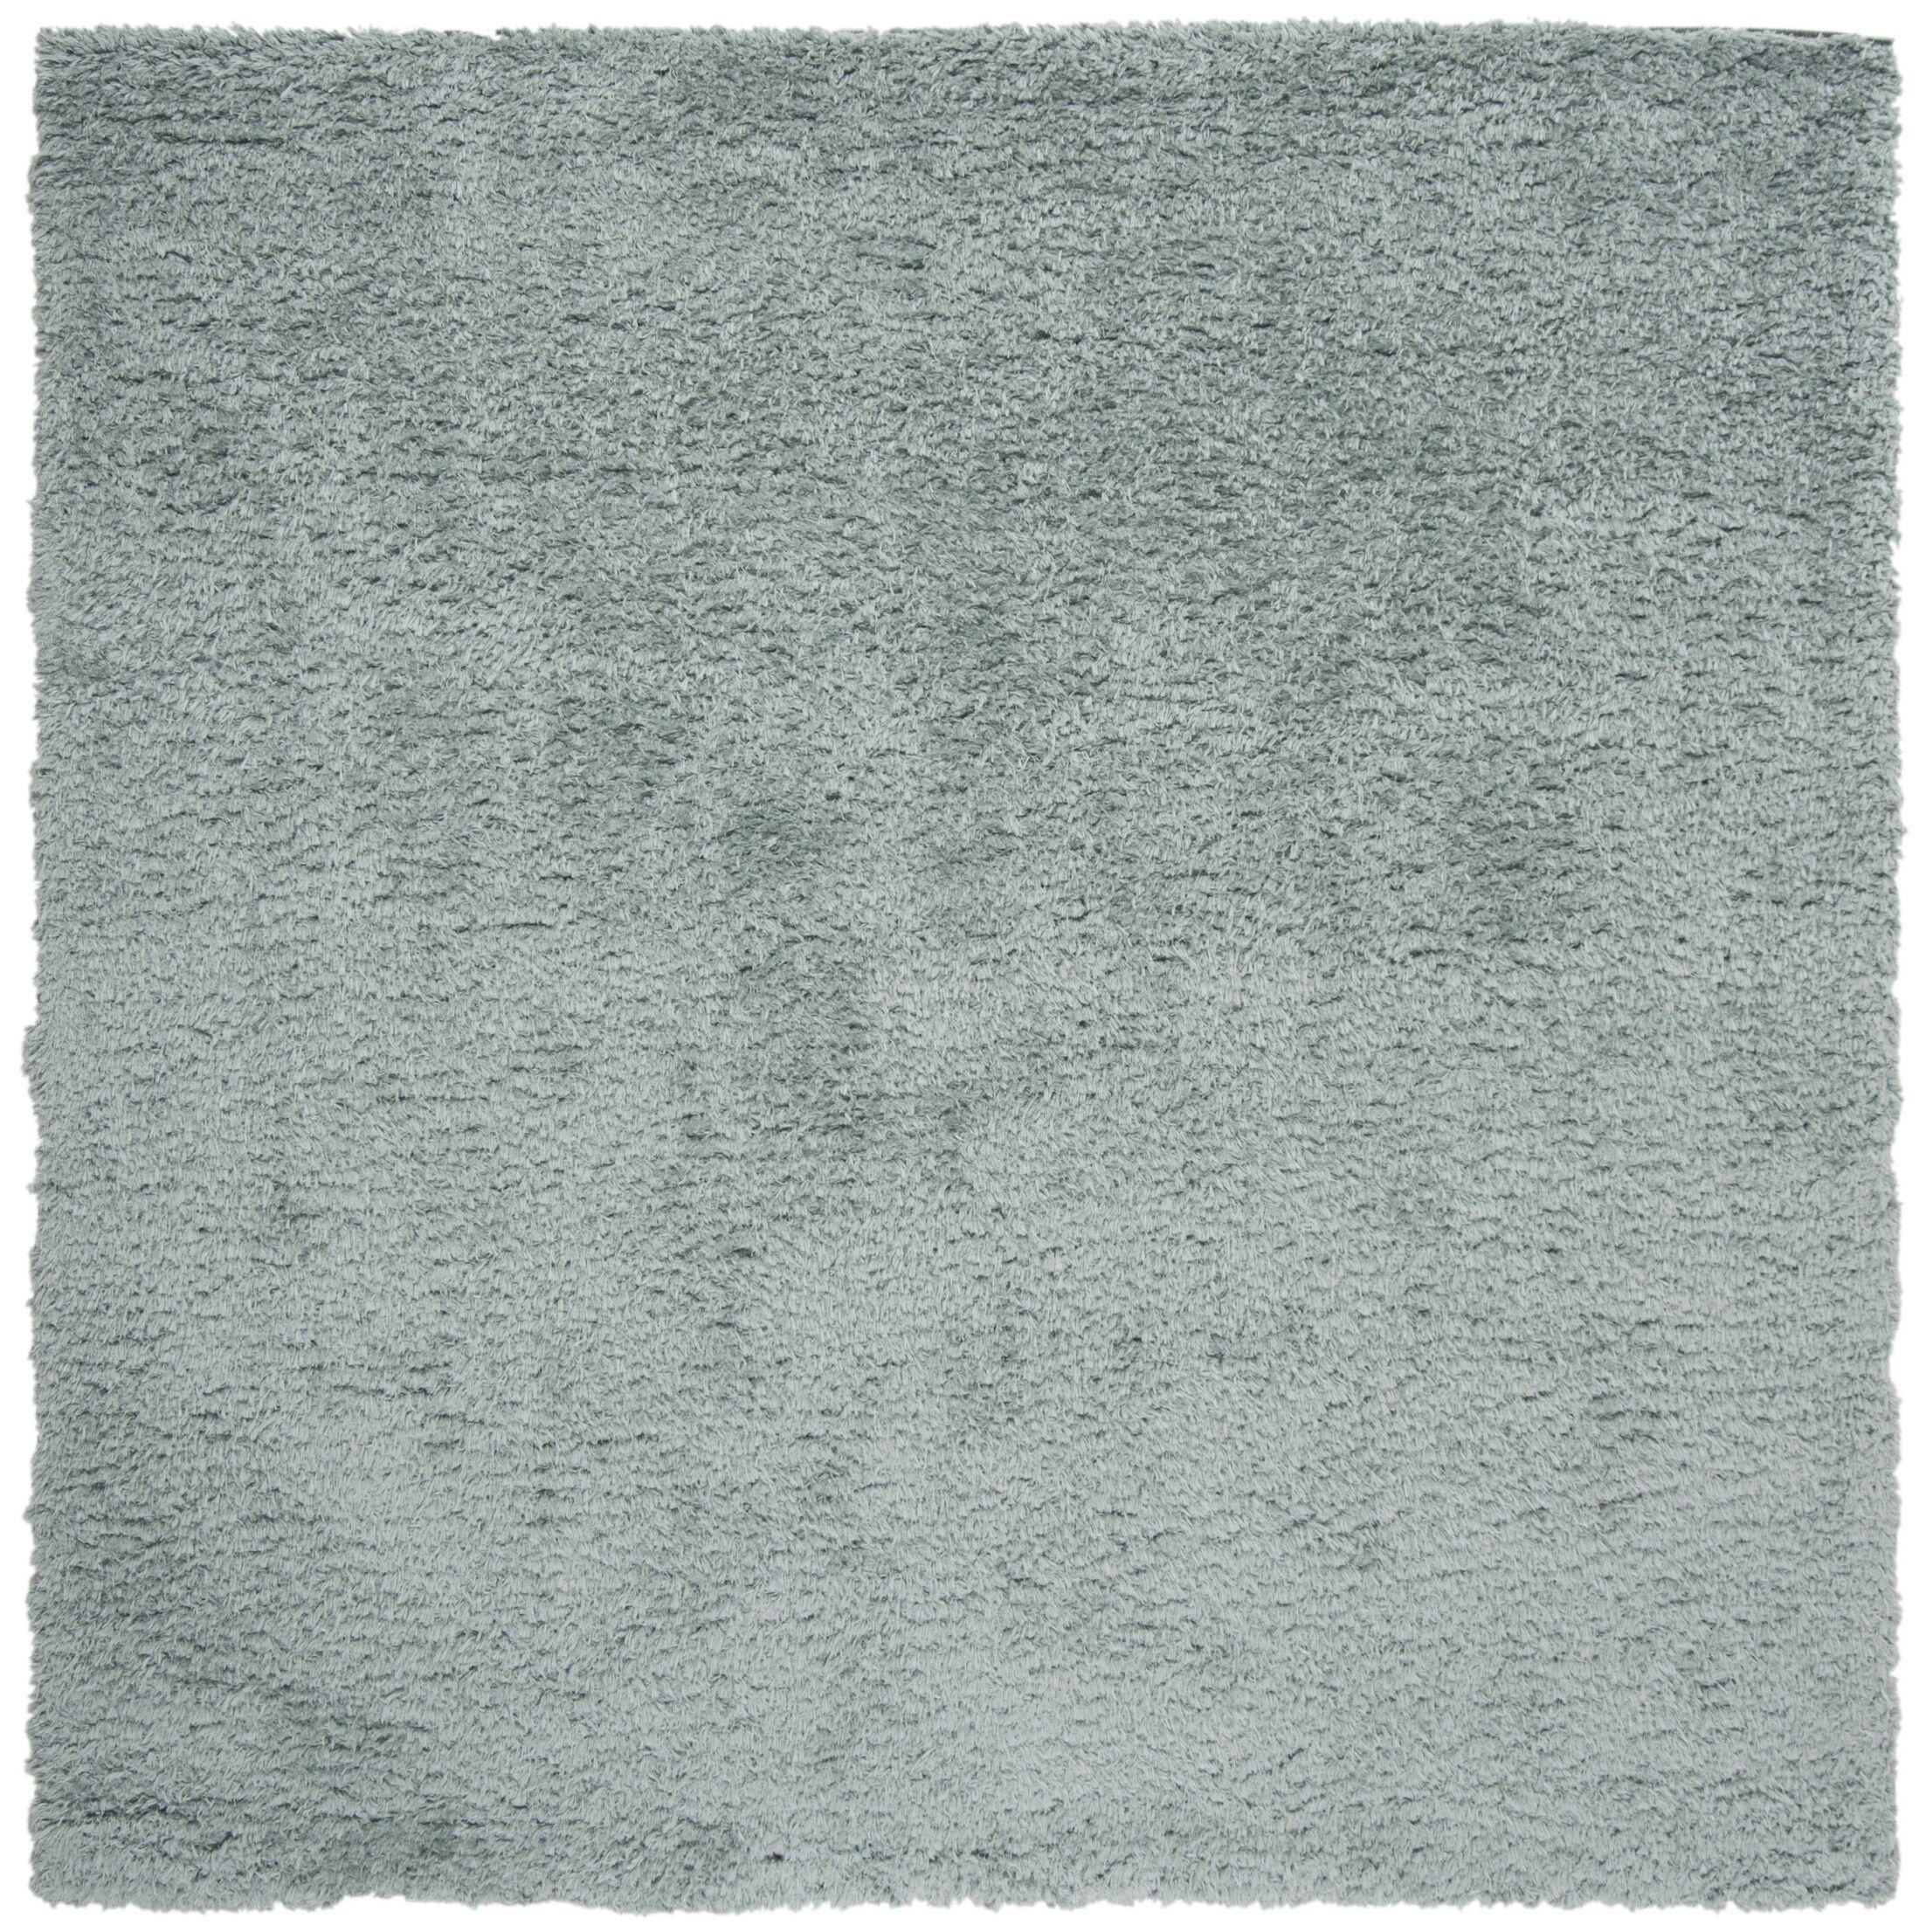 Chertsey Aqua Area Rug Rug Size: Square 6'7